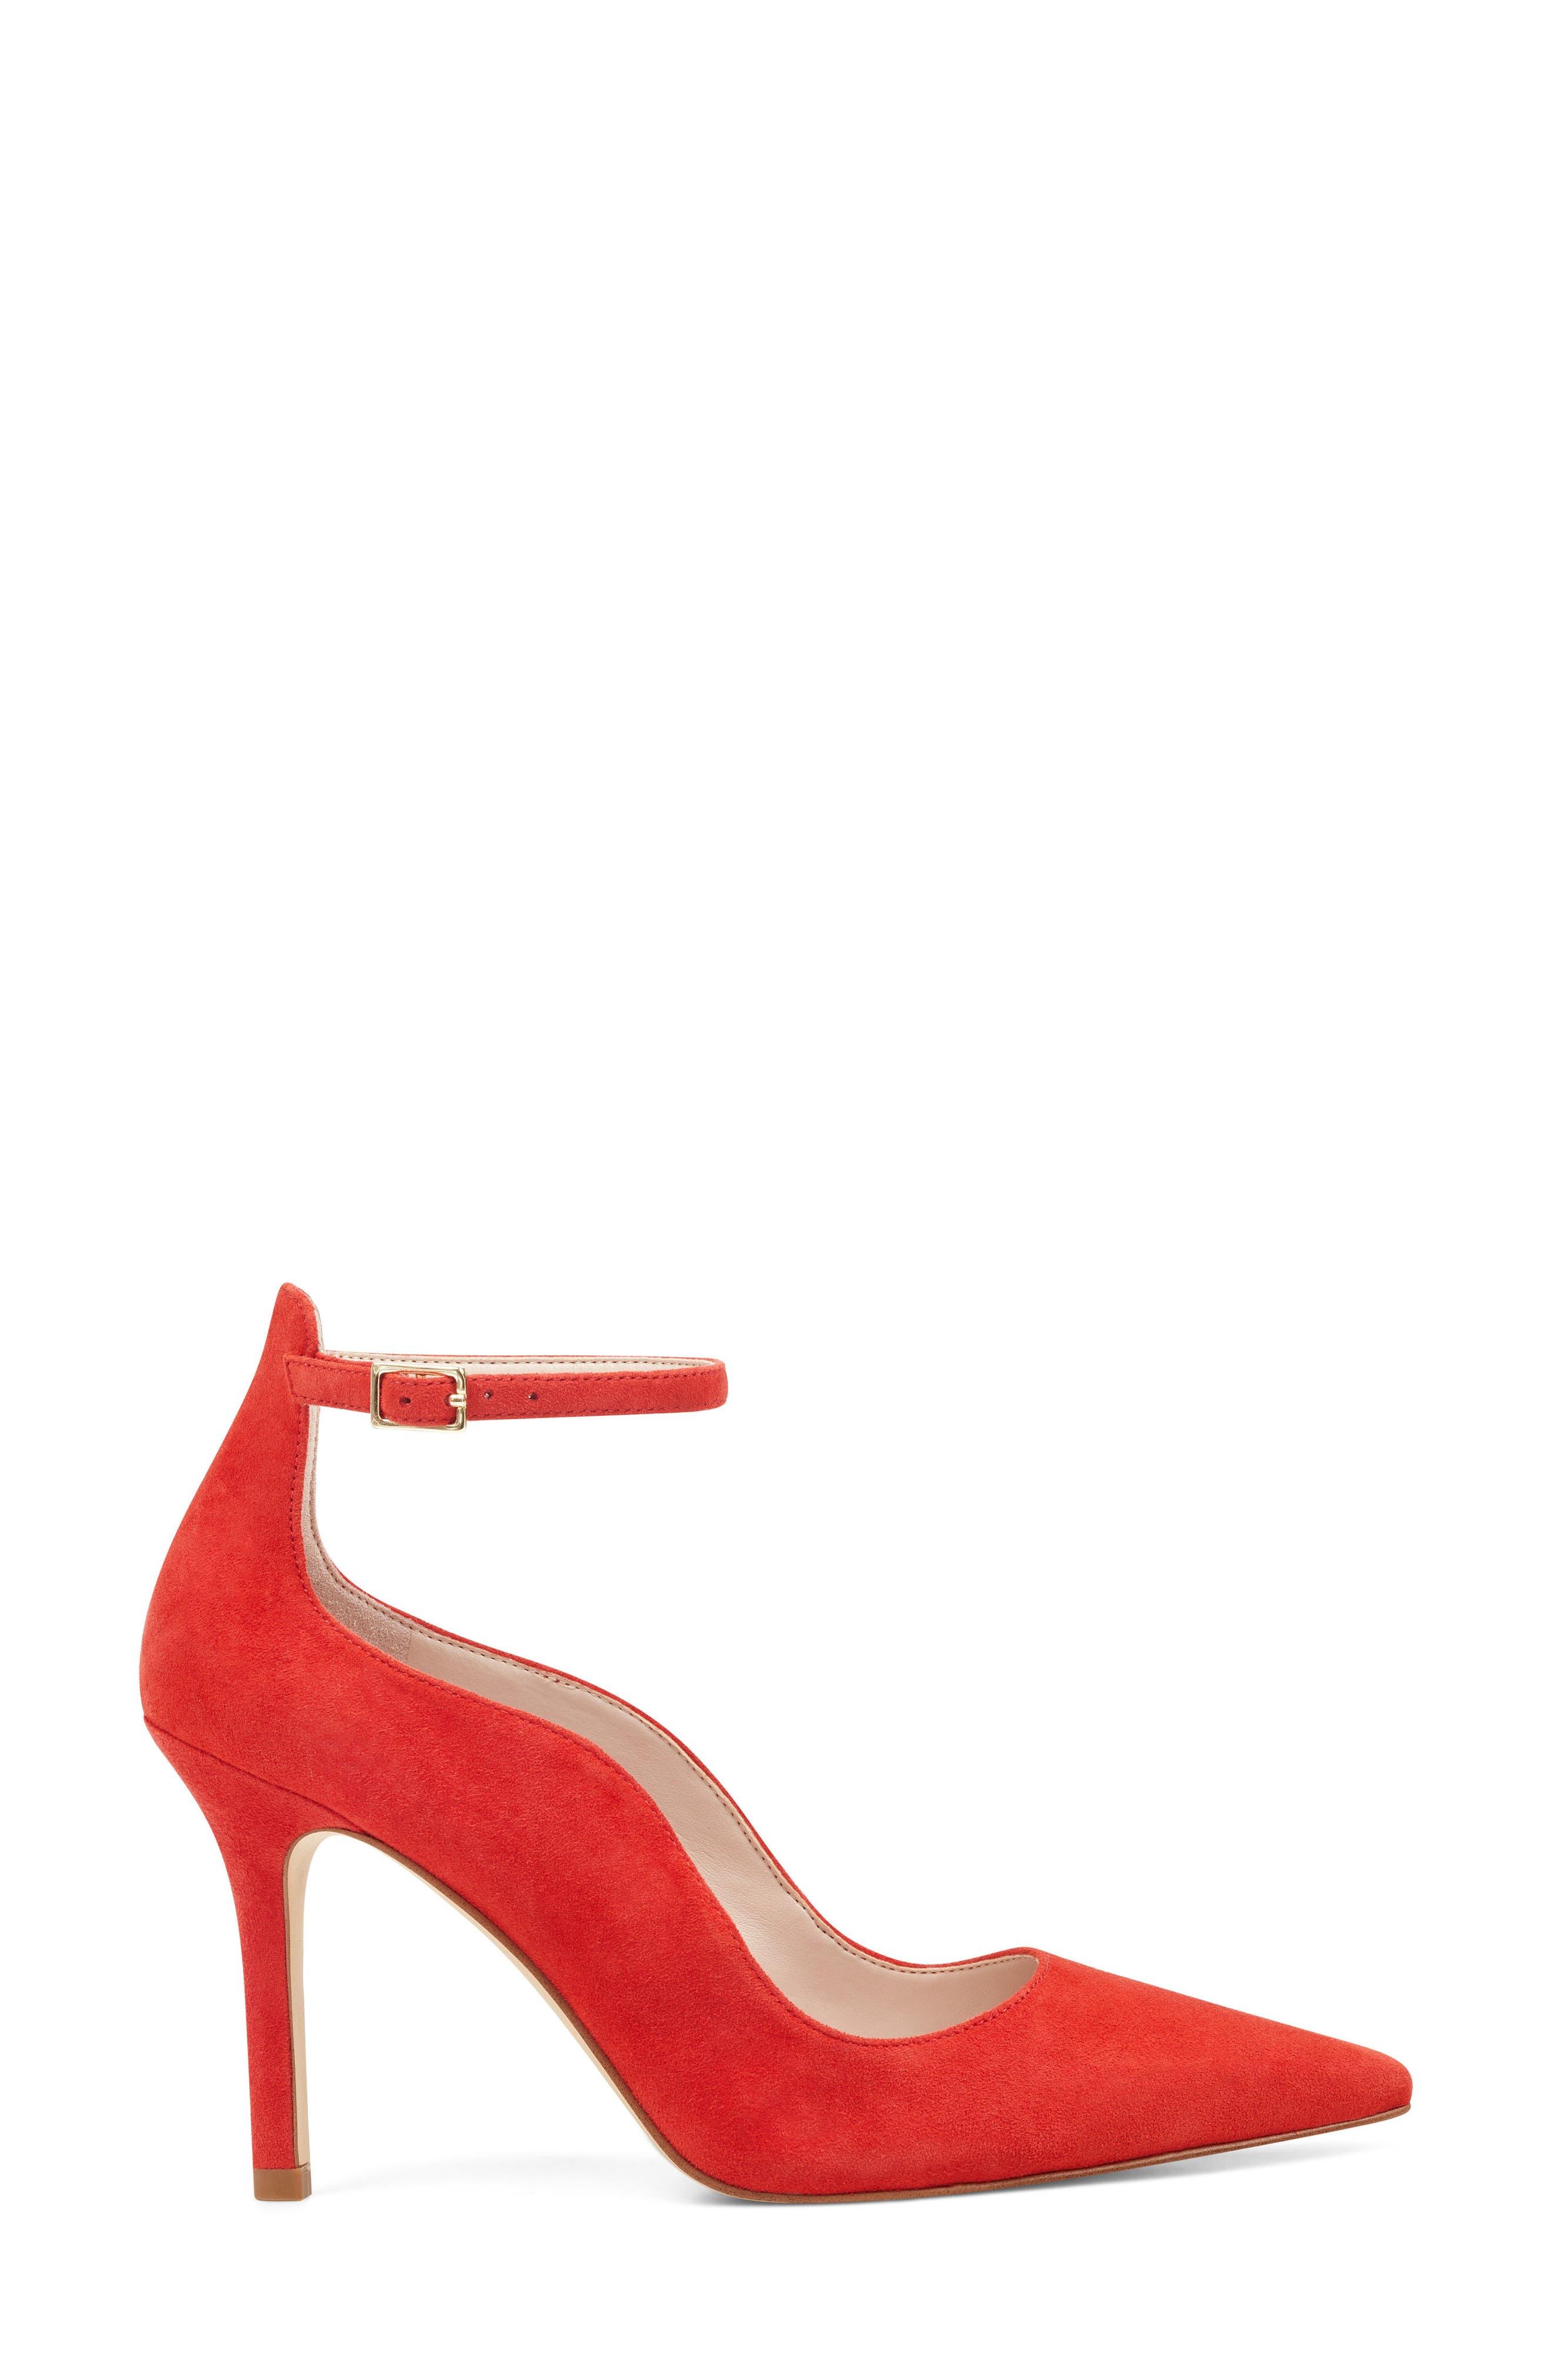 Marquisha Scalloped Ankle Strap Pump,                             Alternate thumbnail 9, color,